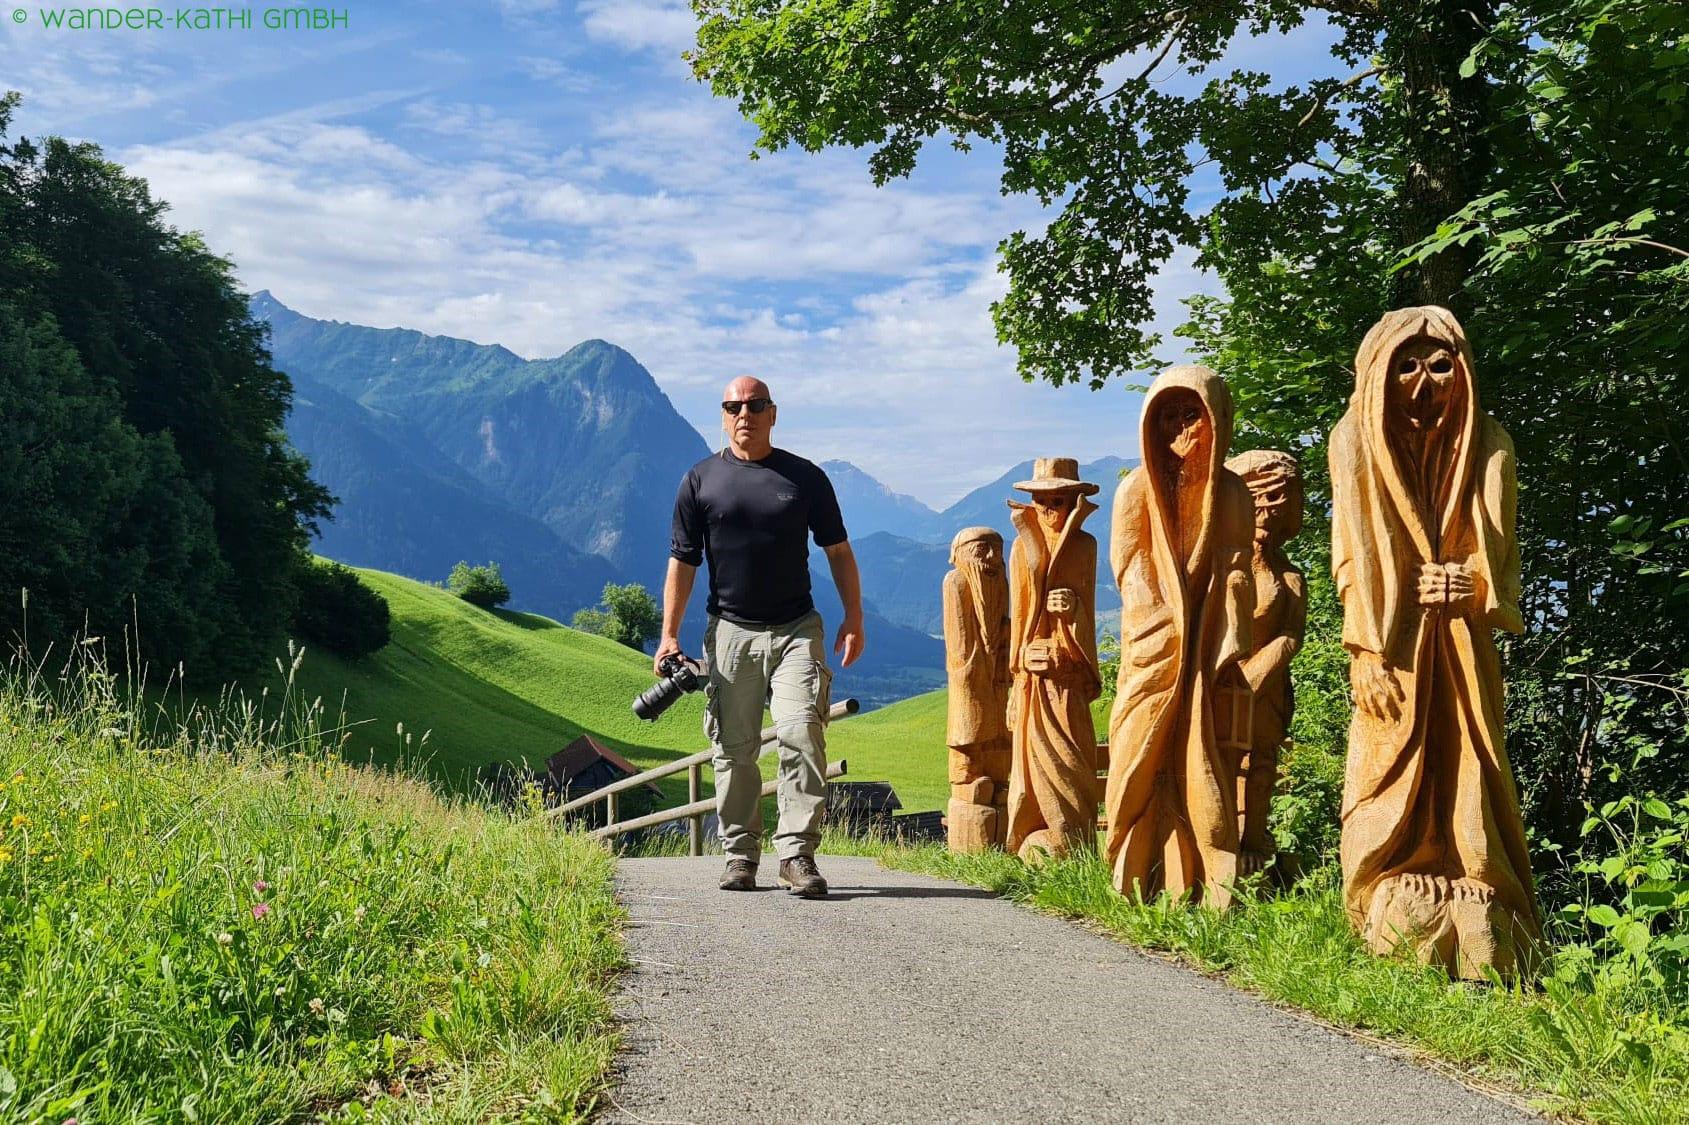 liechtenstein-wandern-teambuilding-leadership-wander-kathi